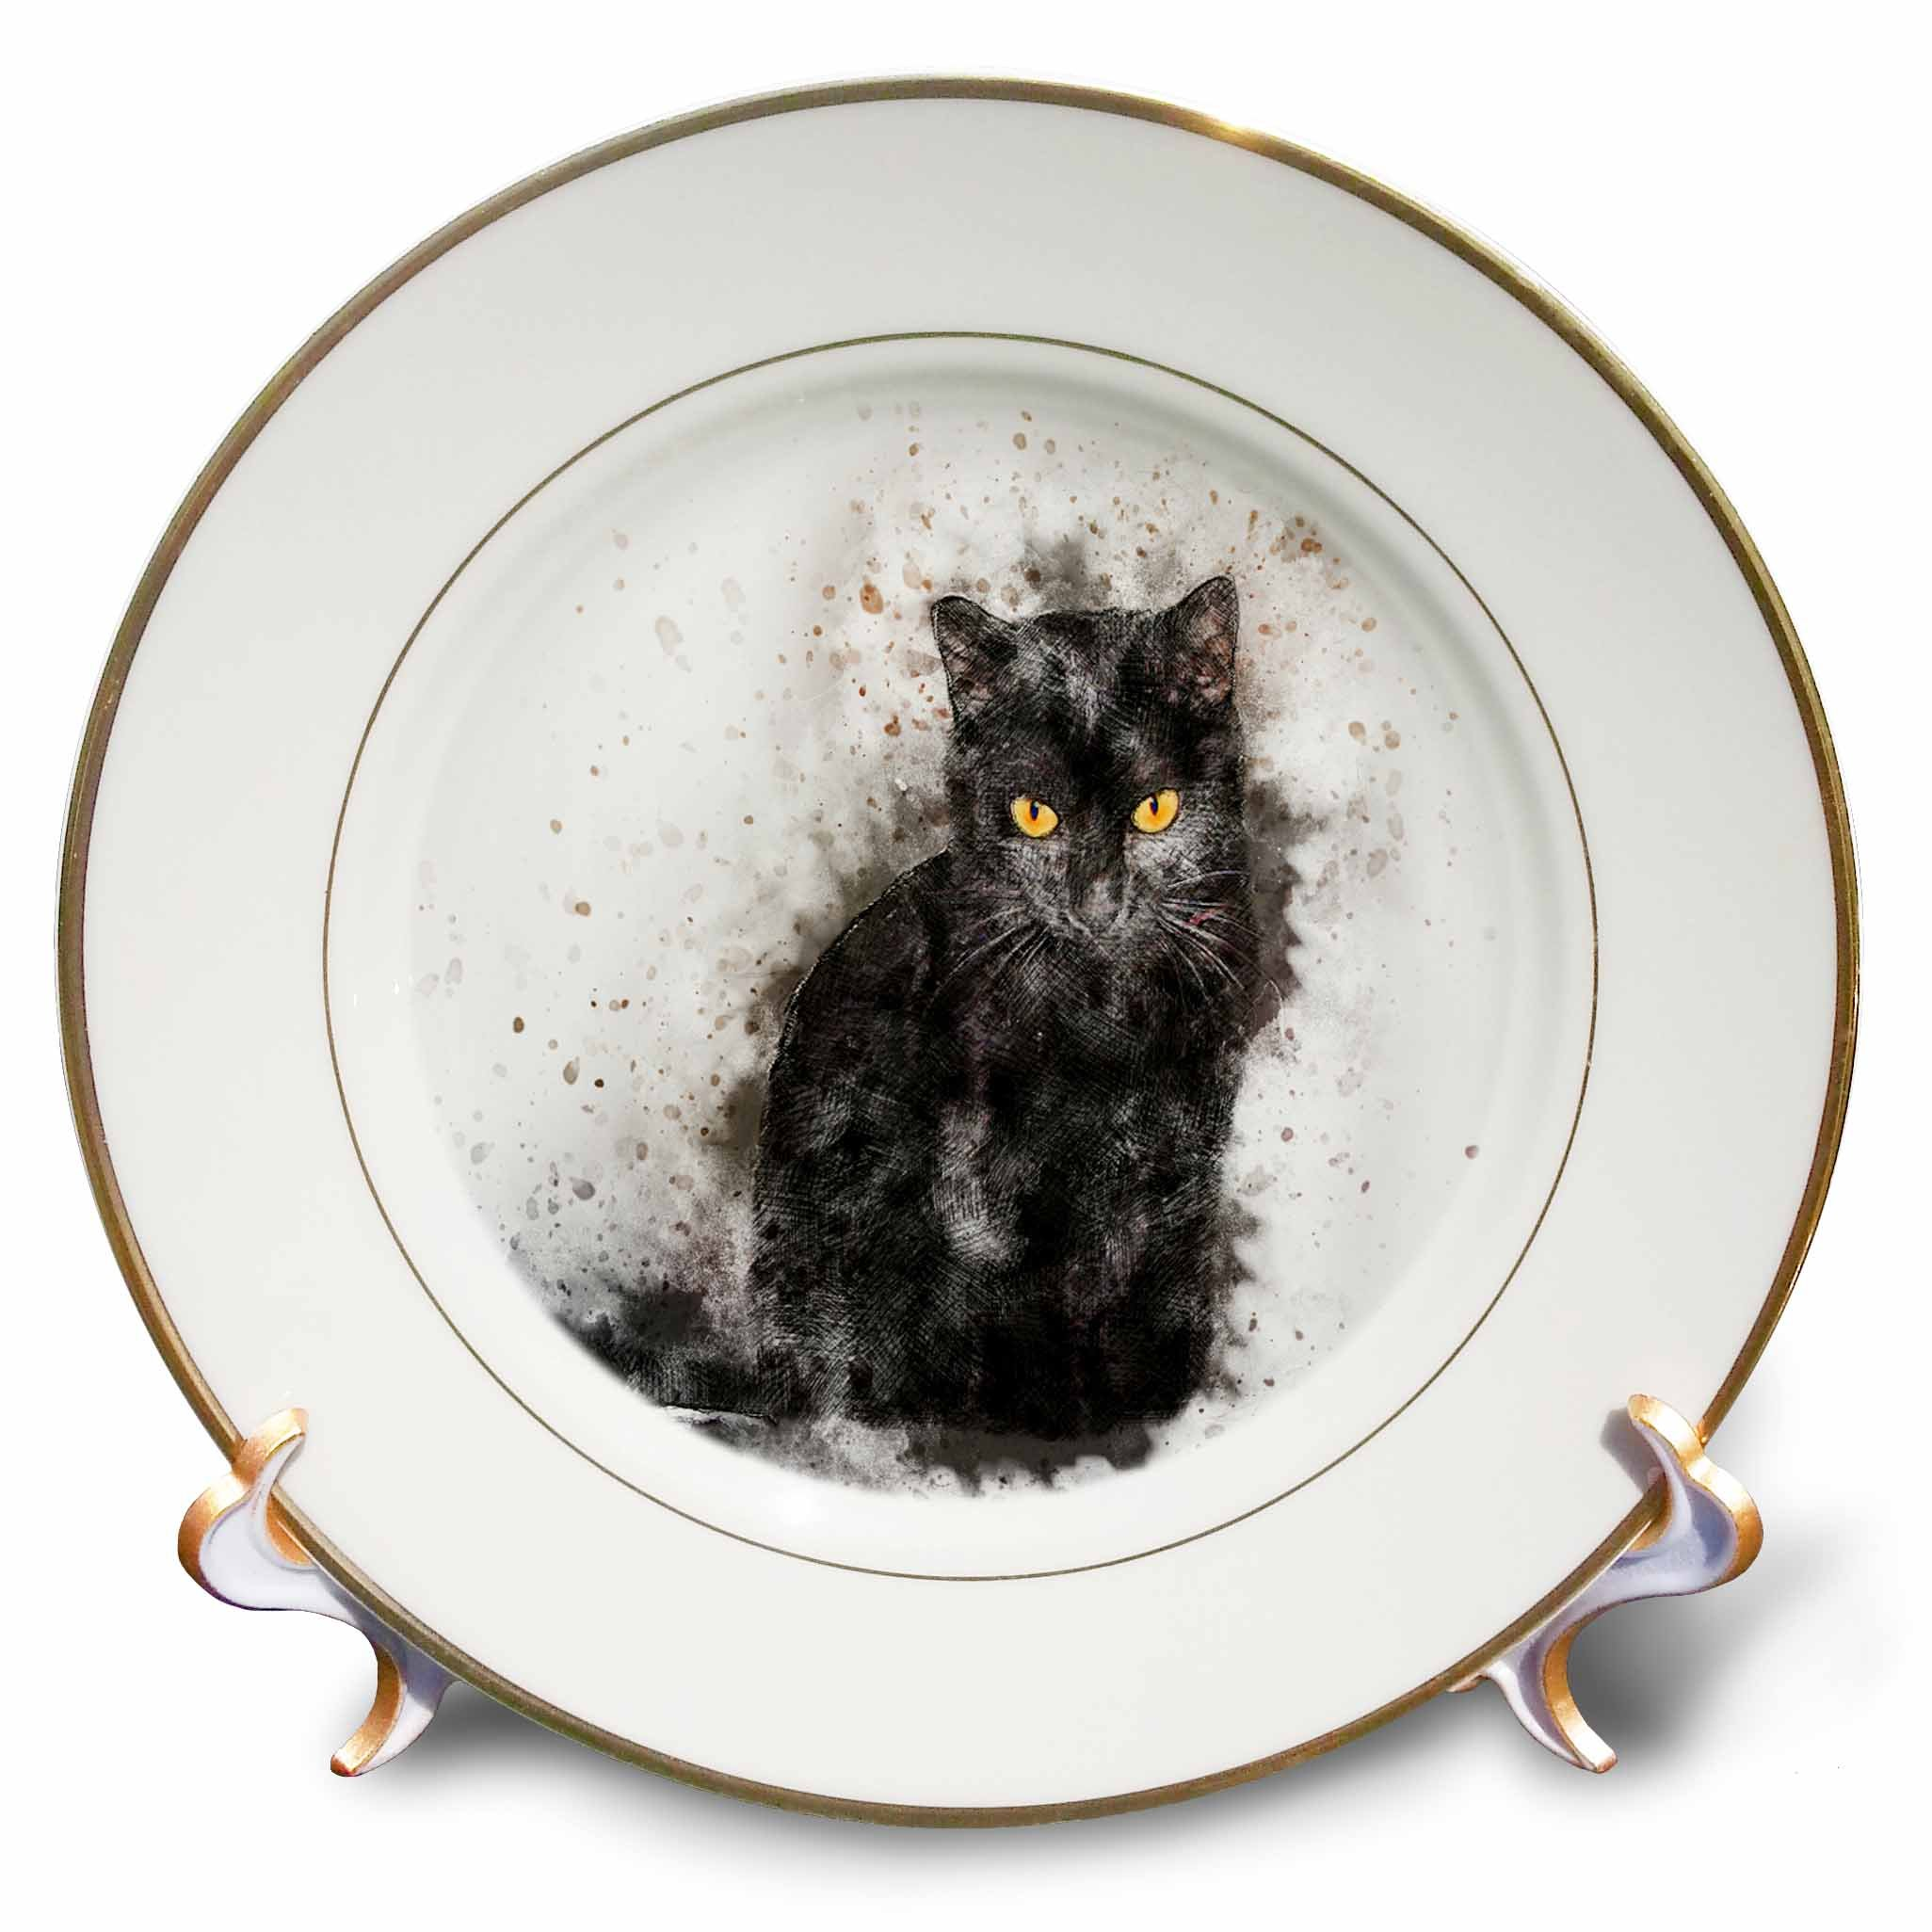 3dRose Sven Herkenrath Animal - Funny Watercolor Cat Pet Animal - 8 inch Porcelain Plate (cp_280273_1)